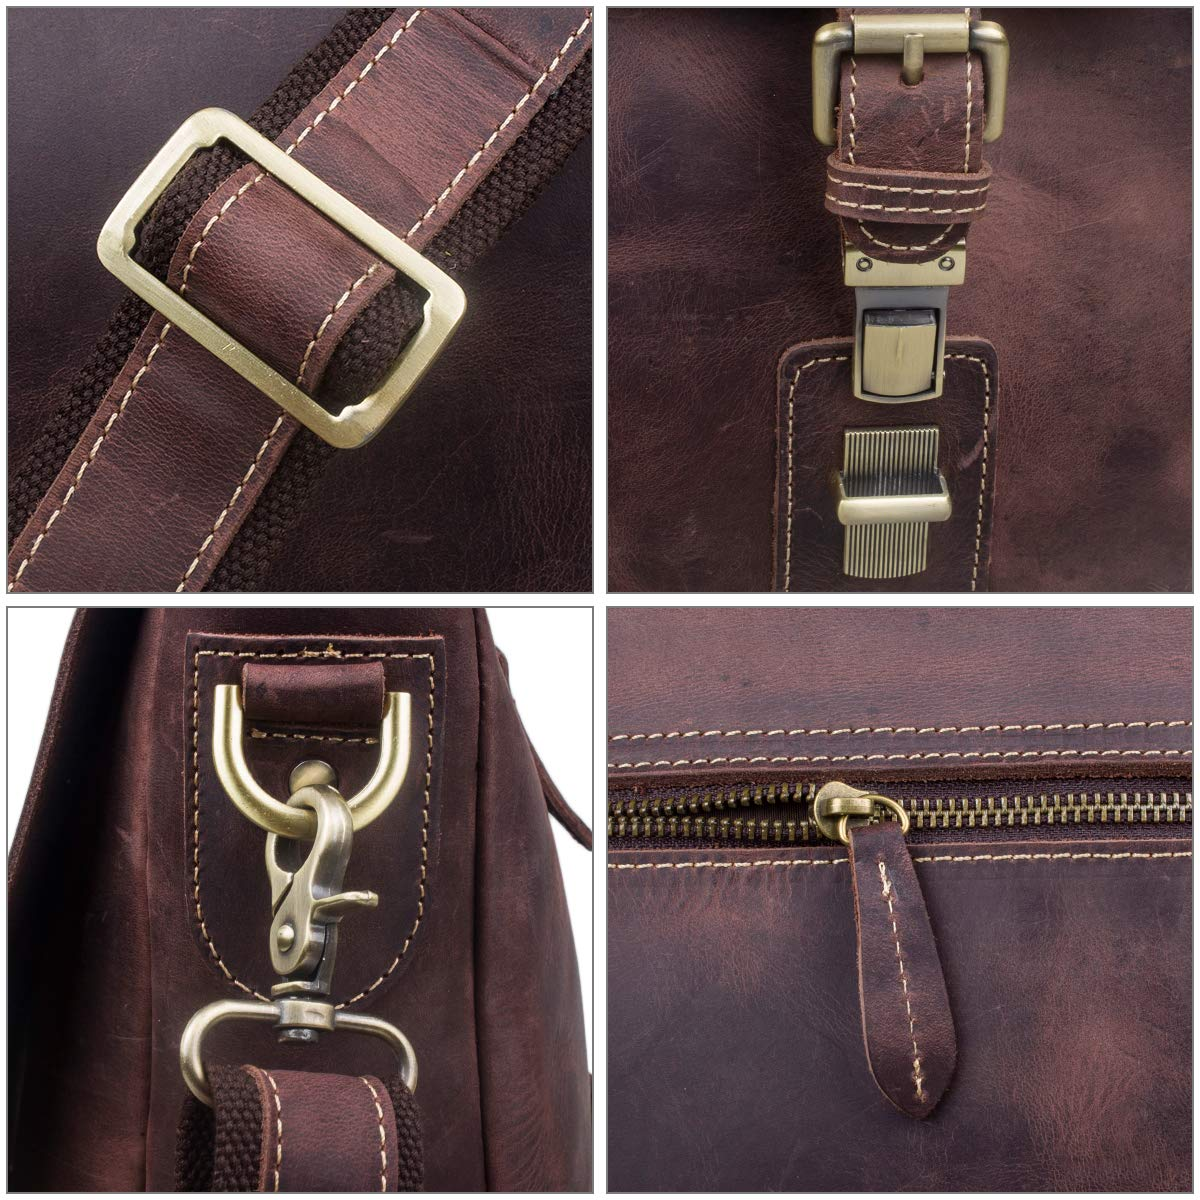 S-ZONE Men's Crazy Horse Leather Satchel Briefcase Shoulder Bag Messenger Bag 14'' Laptop Tote Bag by S-ZONE (Image #6)